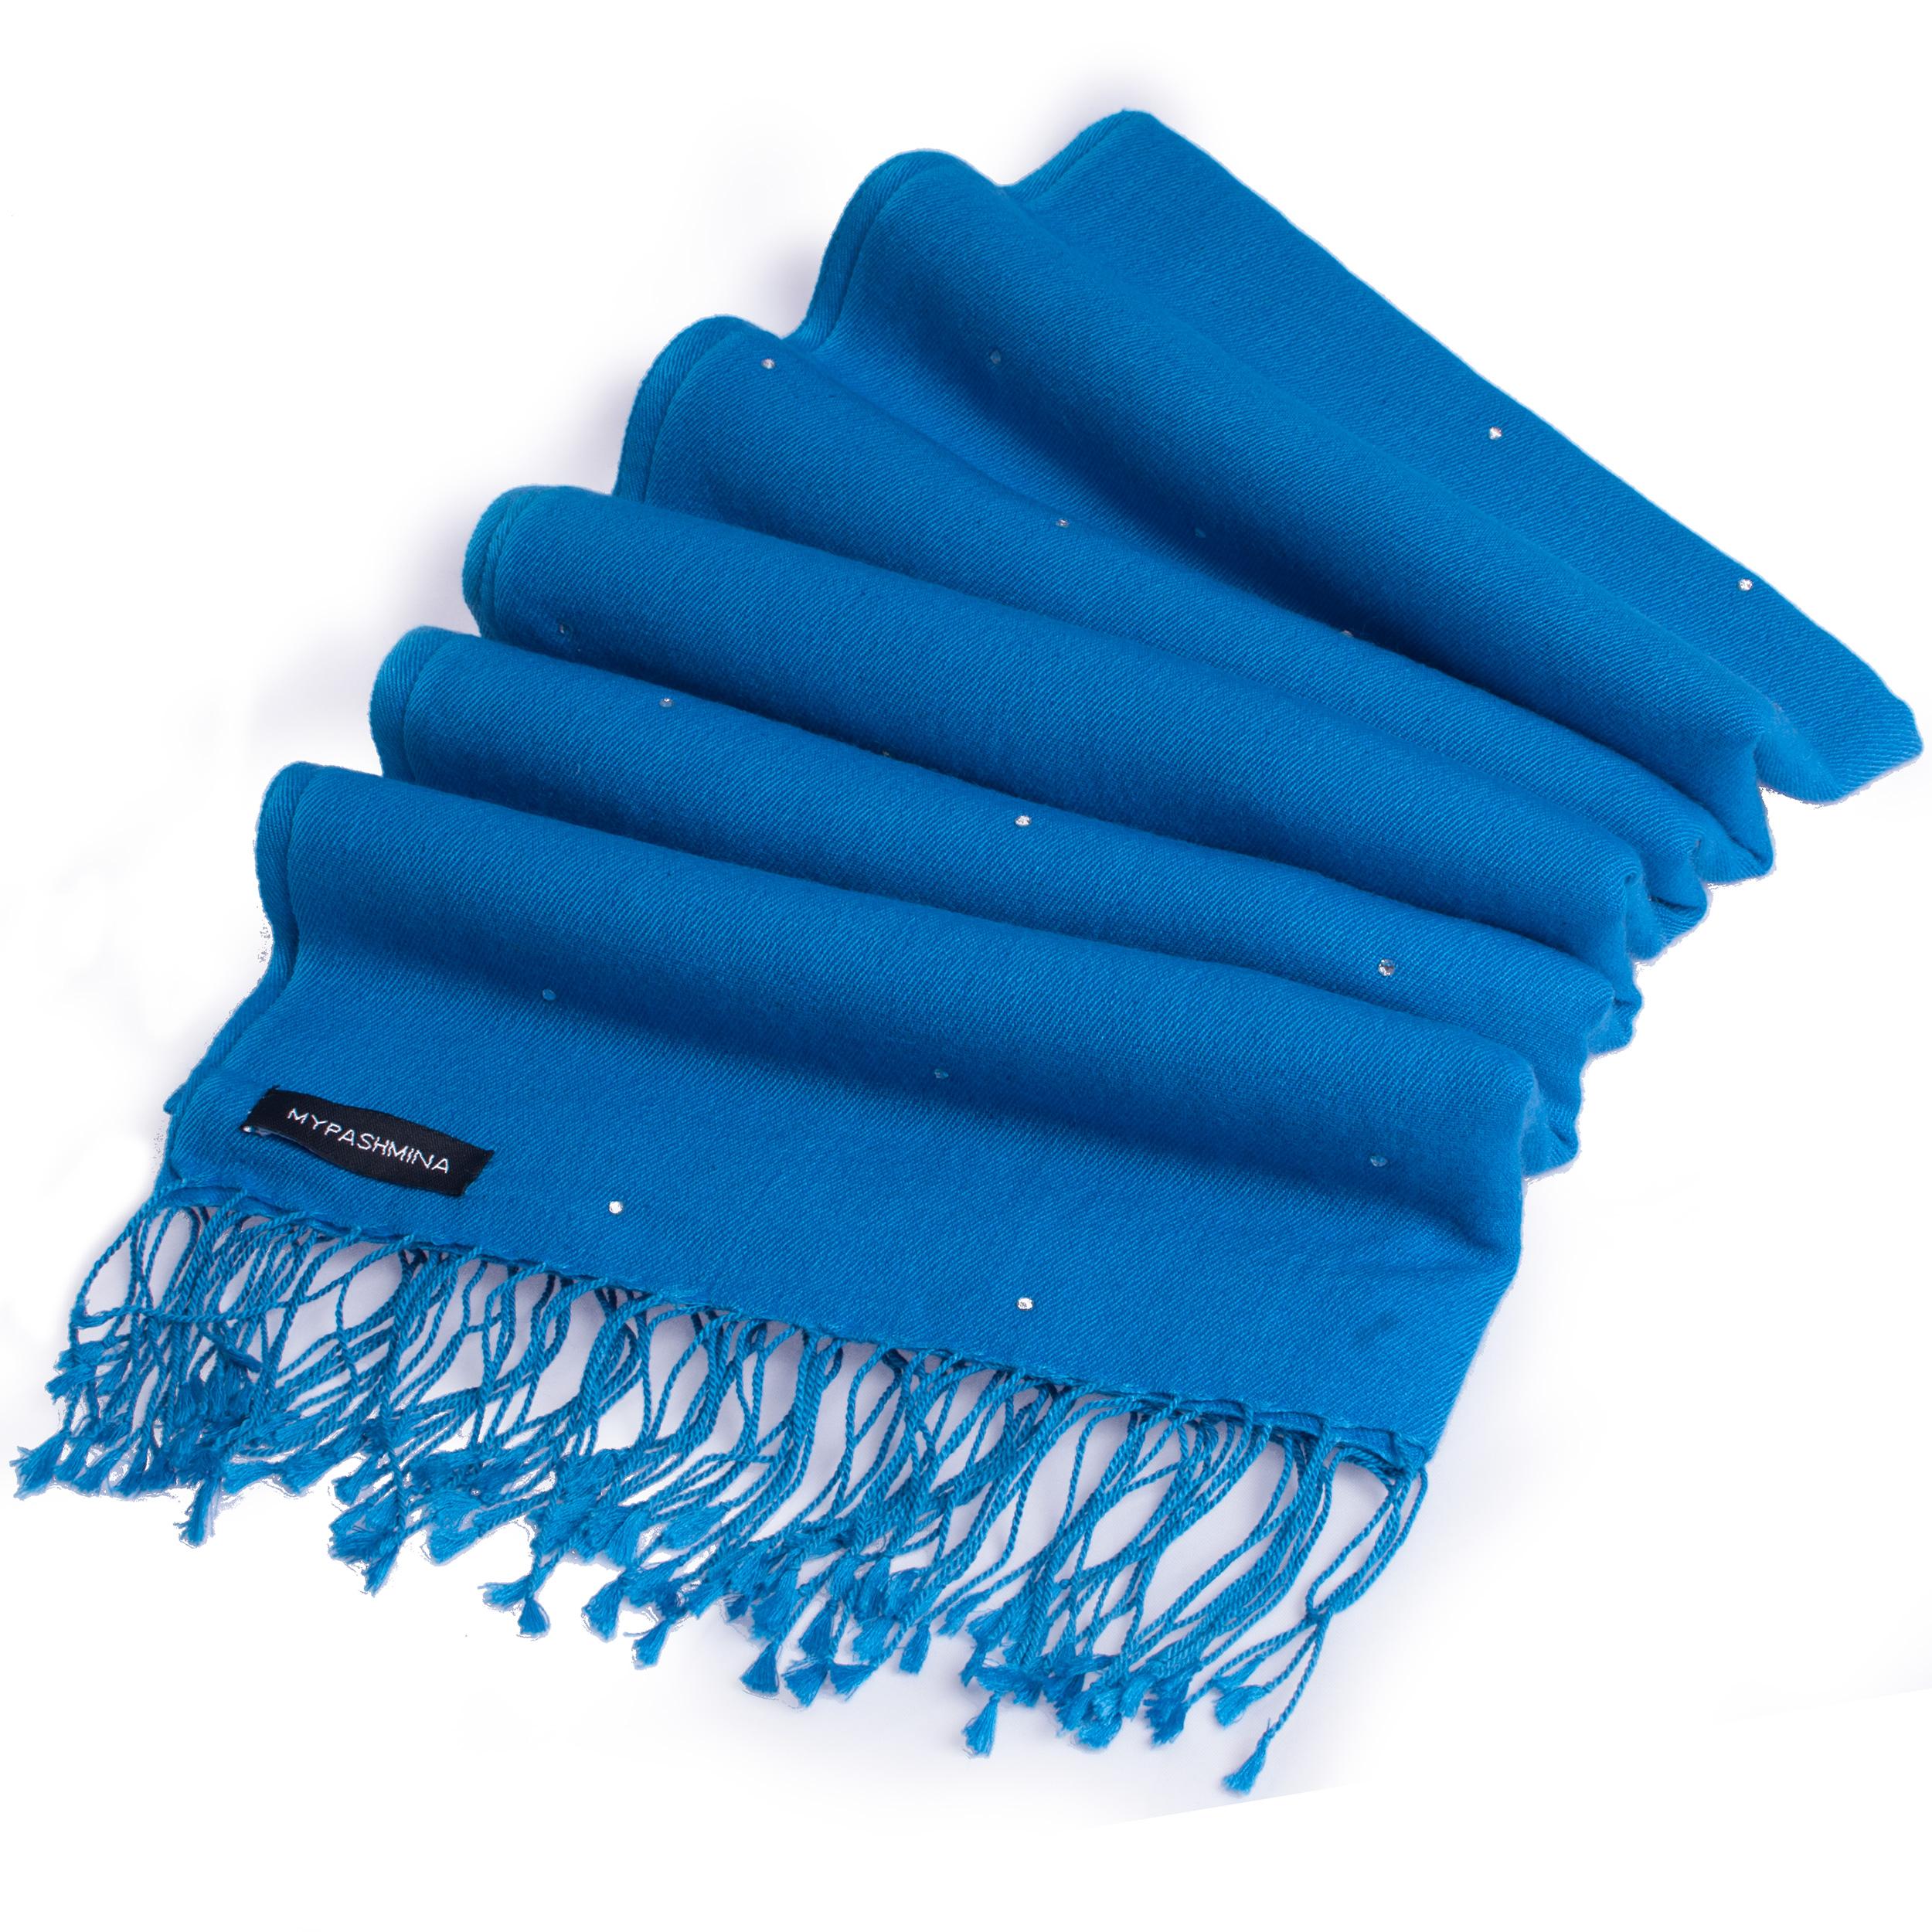 Swarovski Crystals Pashmina Stole - 70x200cm - 70% Cashmere / 30% Silk -  Brilliant Blue